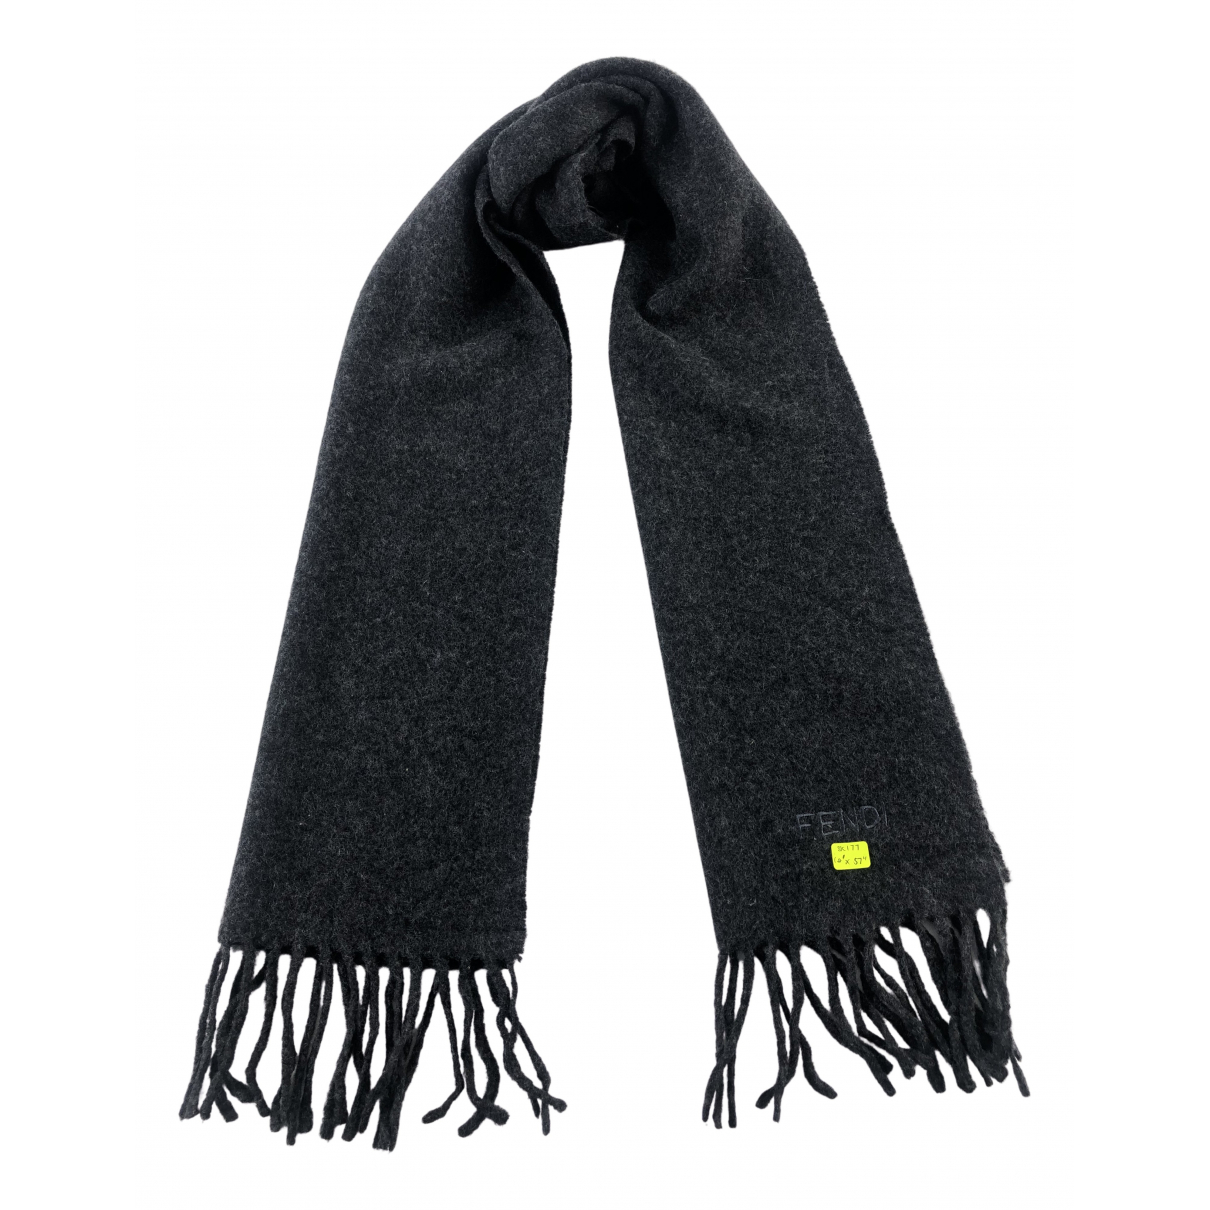 Fendi N Grey Wool scarf & pocket squares for Men N